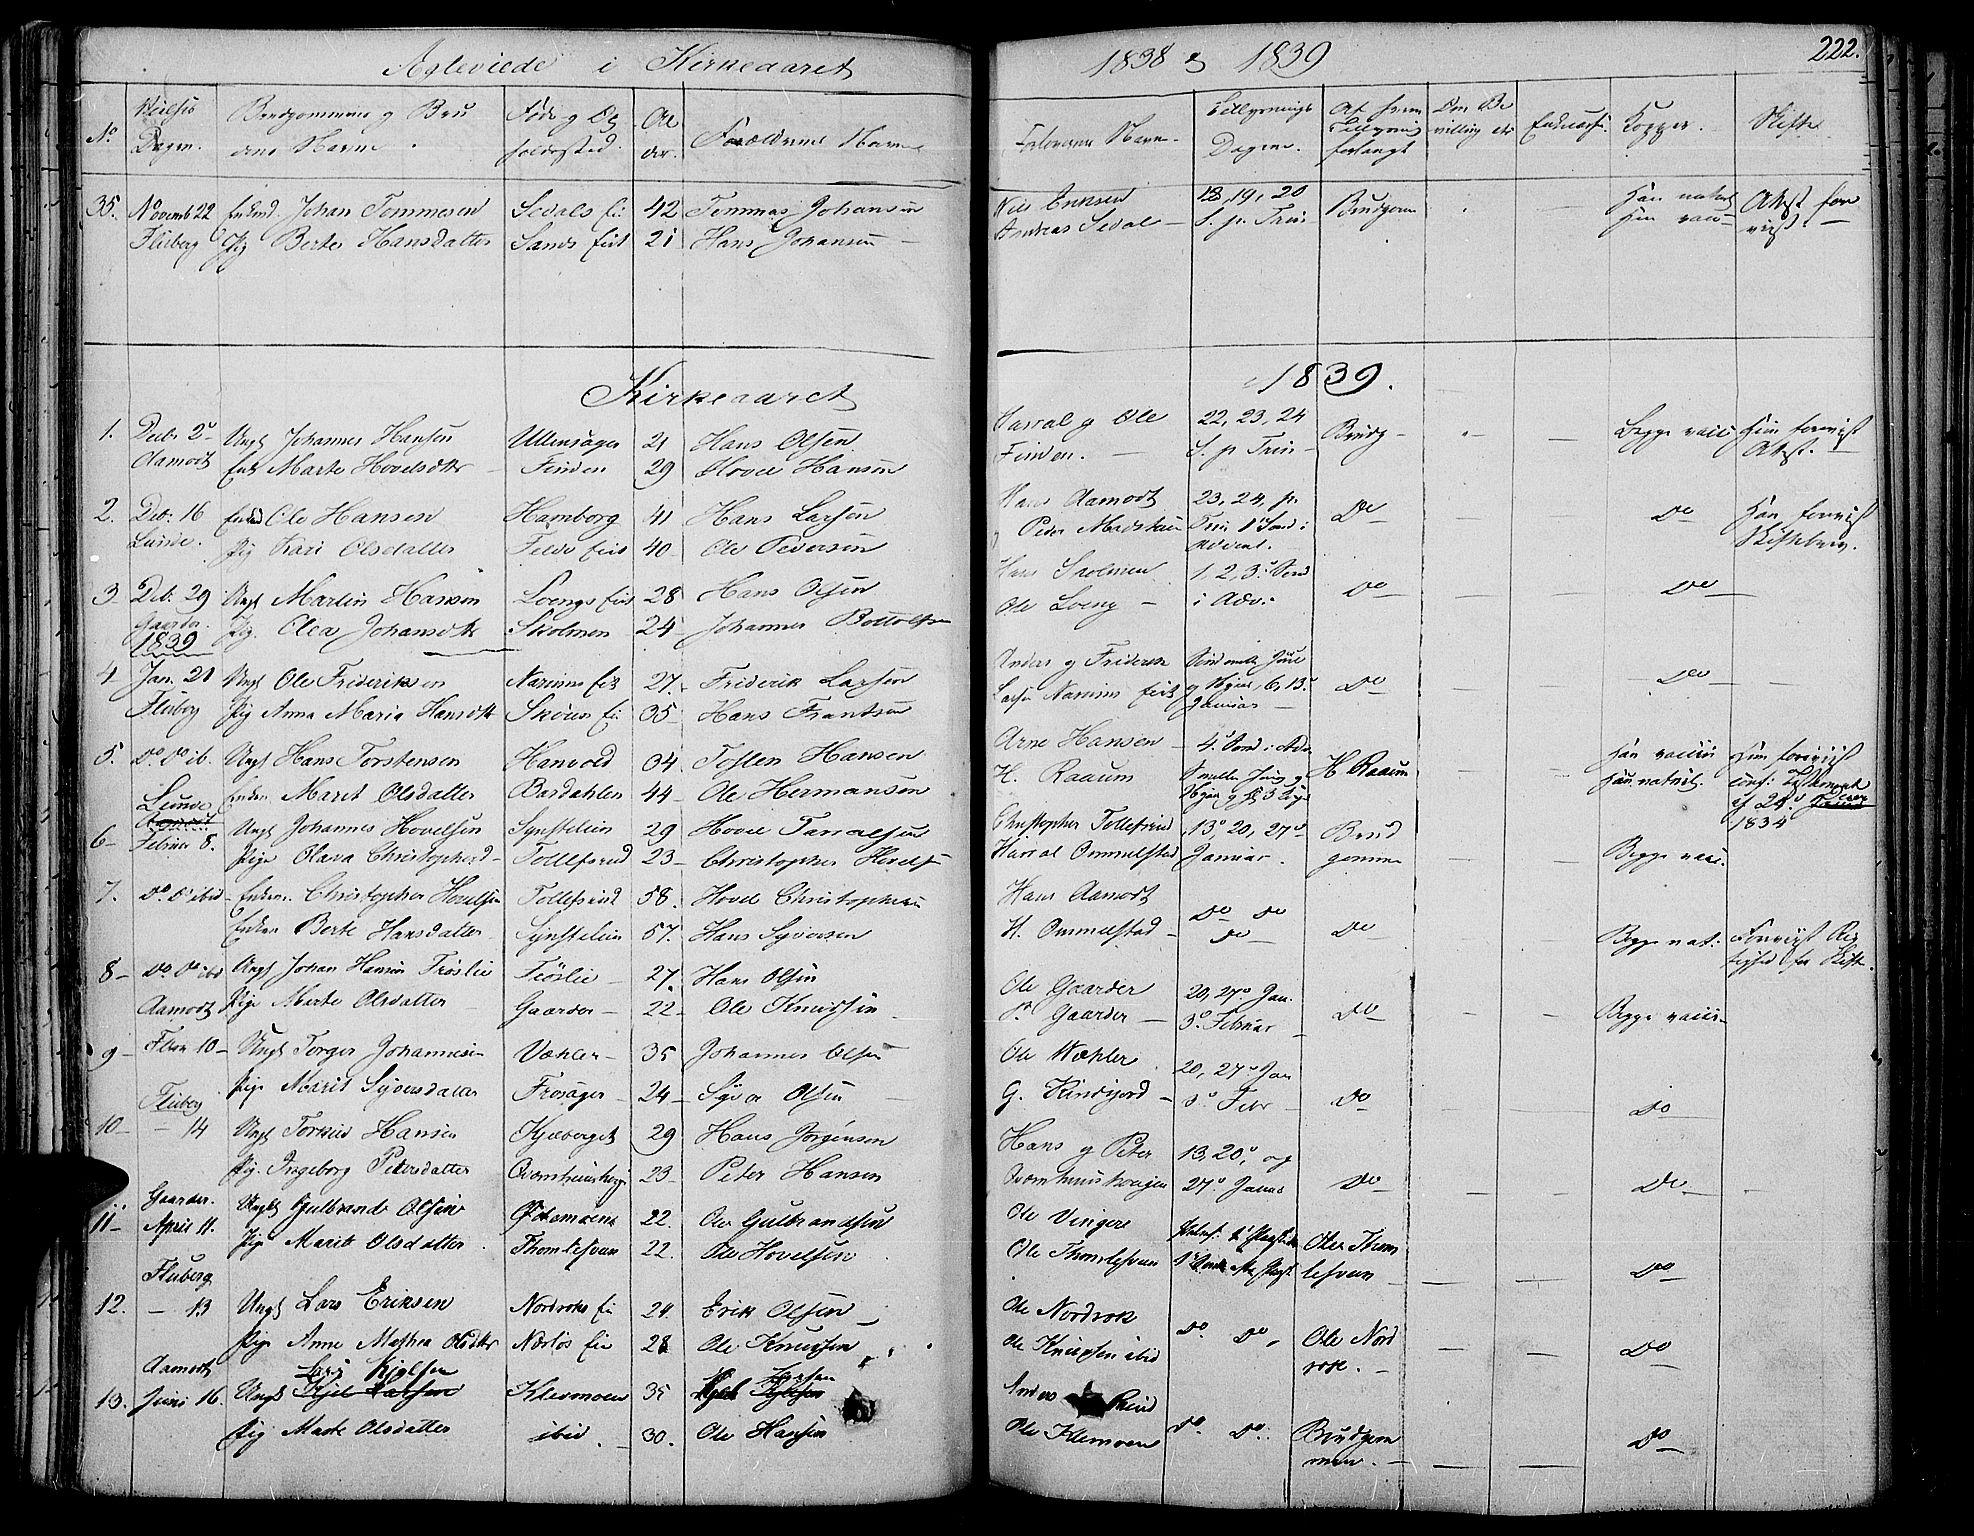 SAH, Land prestekontor, Ministerialbok nr. 8, 1830-1846, s. 222